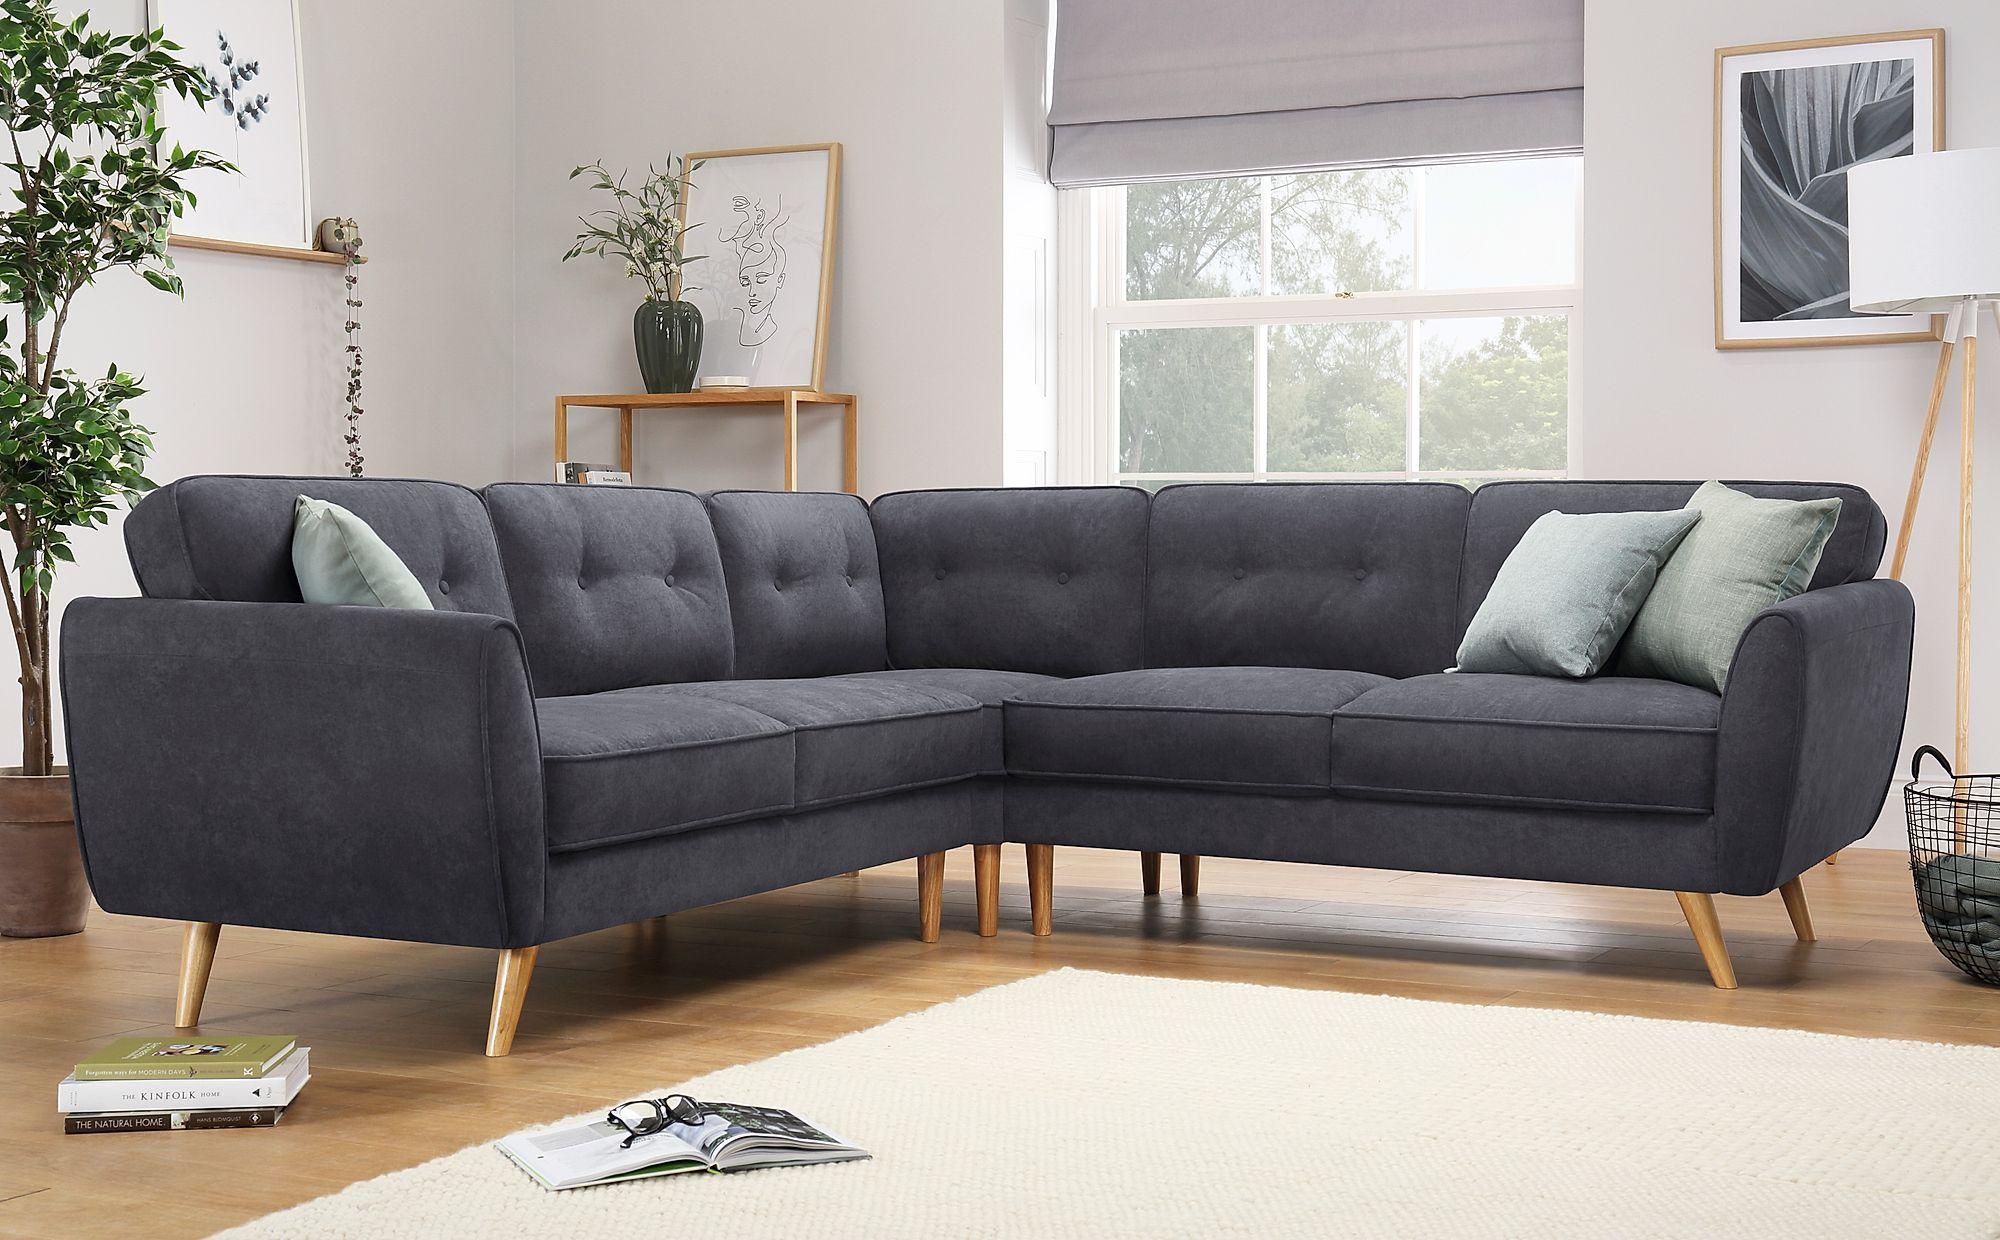 Harlow Dove Grey Plush Fabric Corner Sofa Only 899 99 12 000 Trustpilot Reviews Expert Advice 0 F Corner Sofa Living Room Corner Sofa Grey Corner Sofa